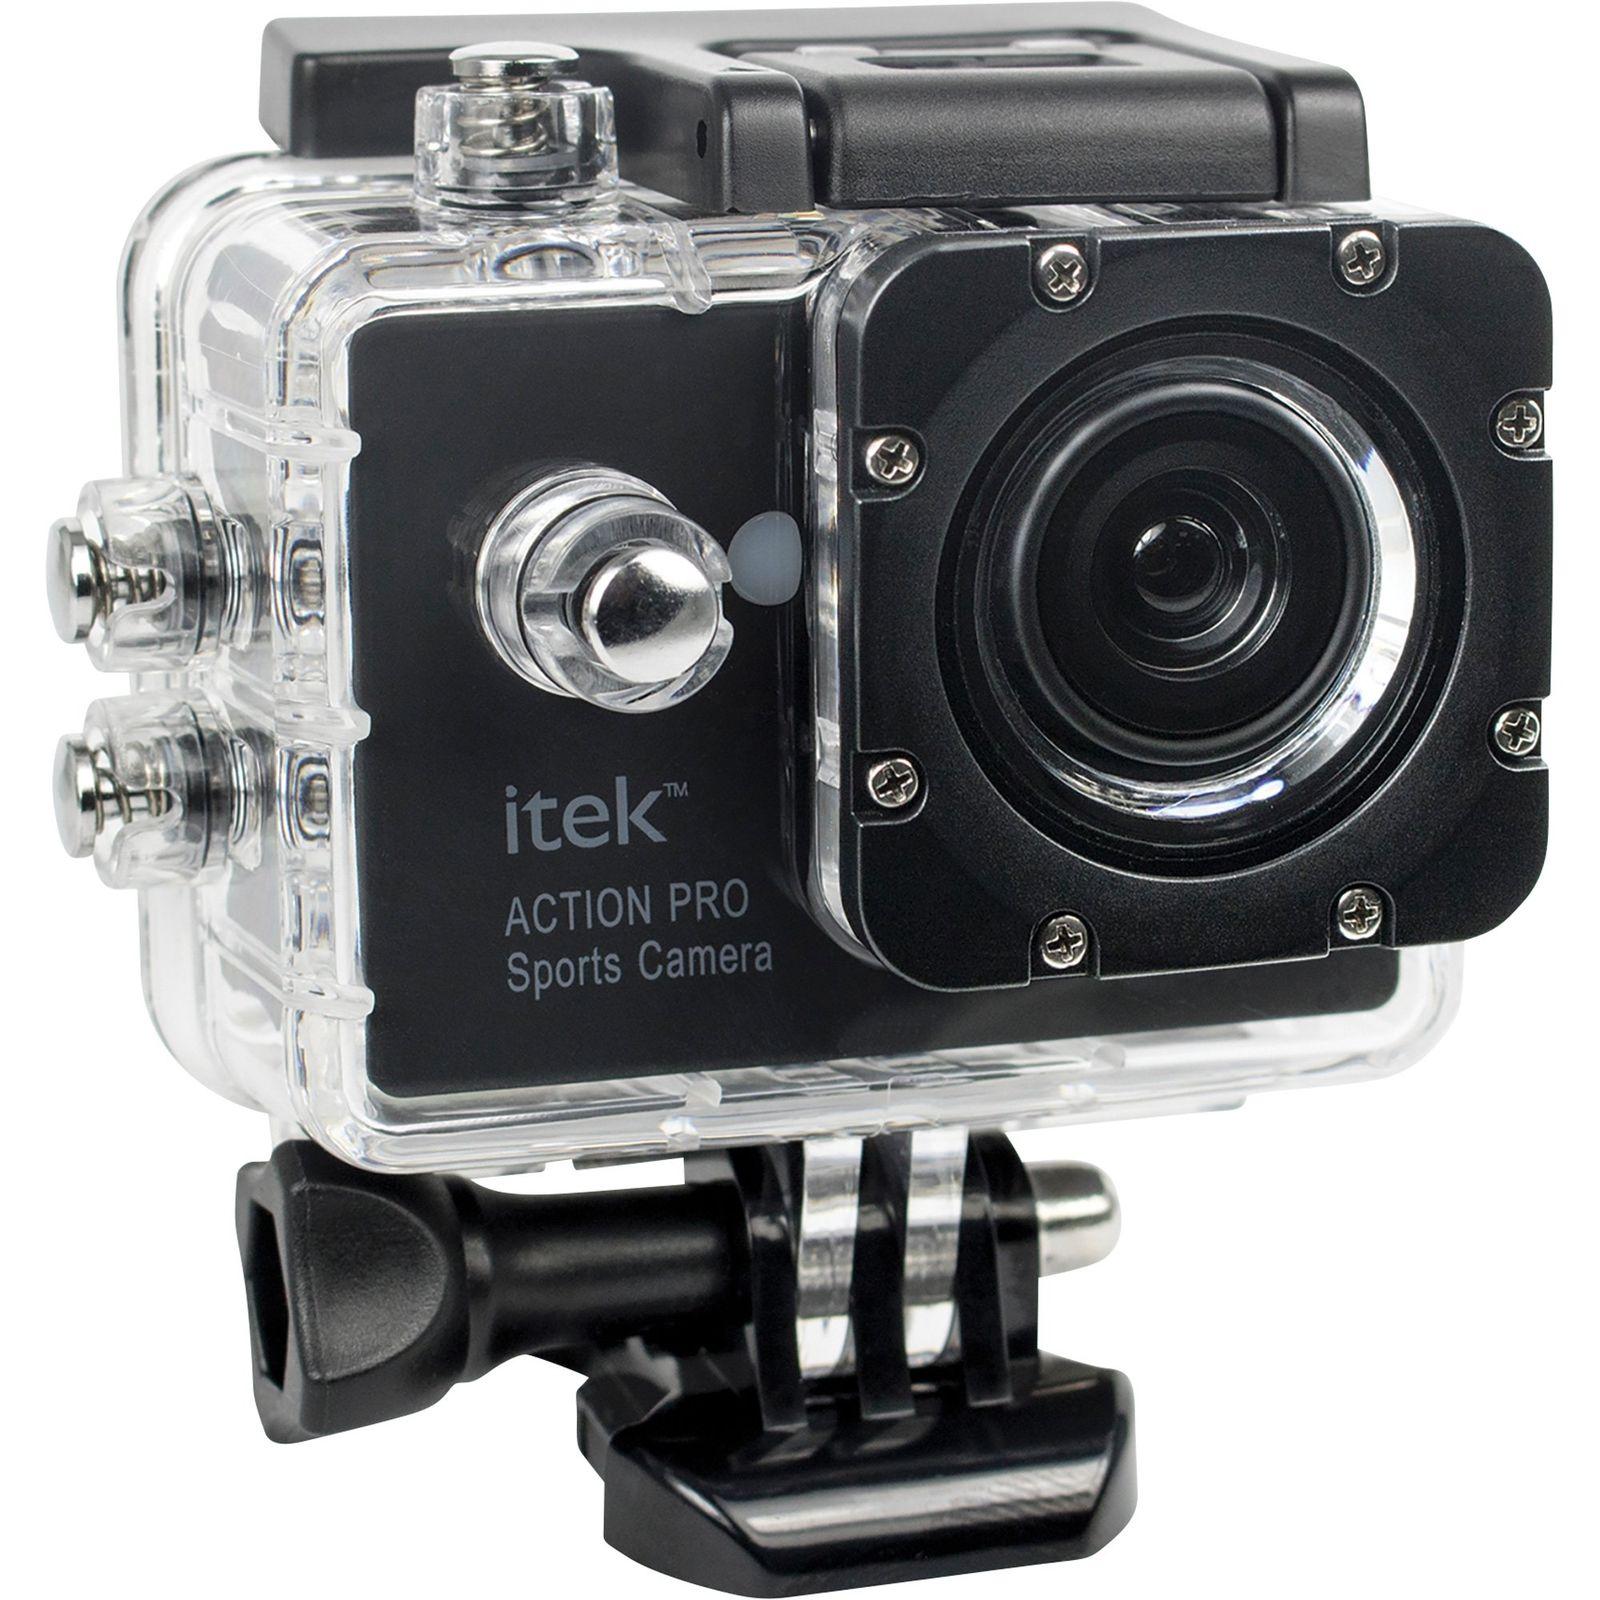 Soundlogic action pro 1080p ultra hd sports camera - waterproof voor €17,99